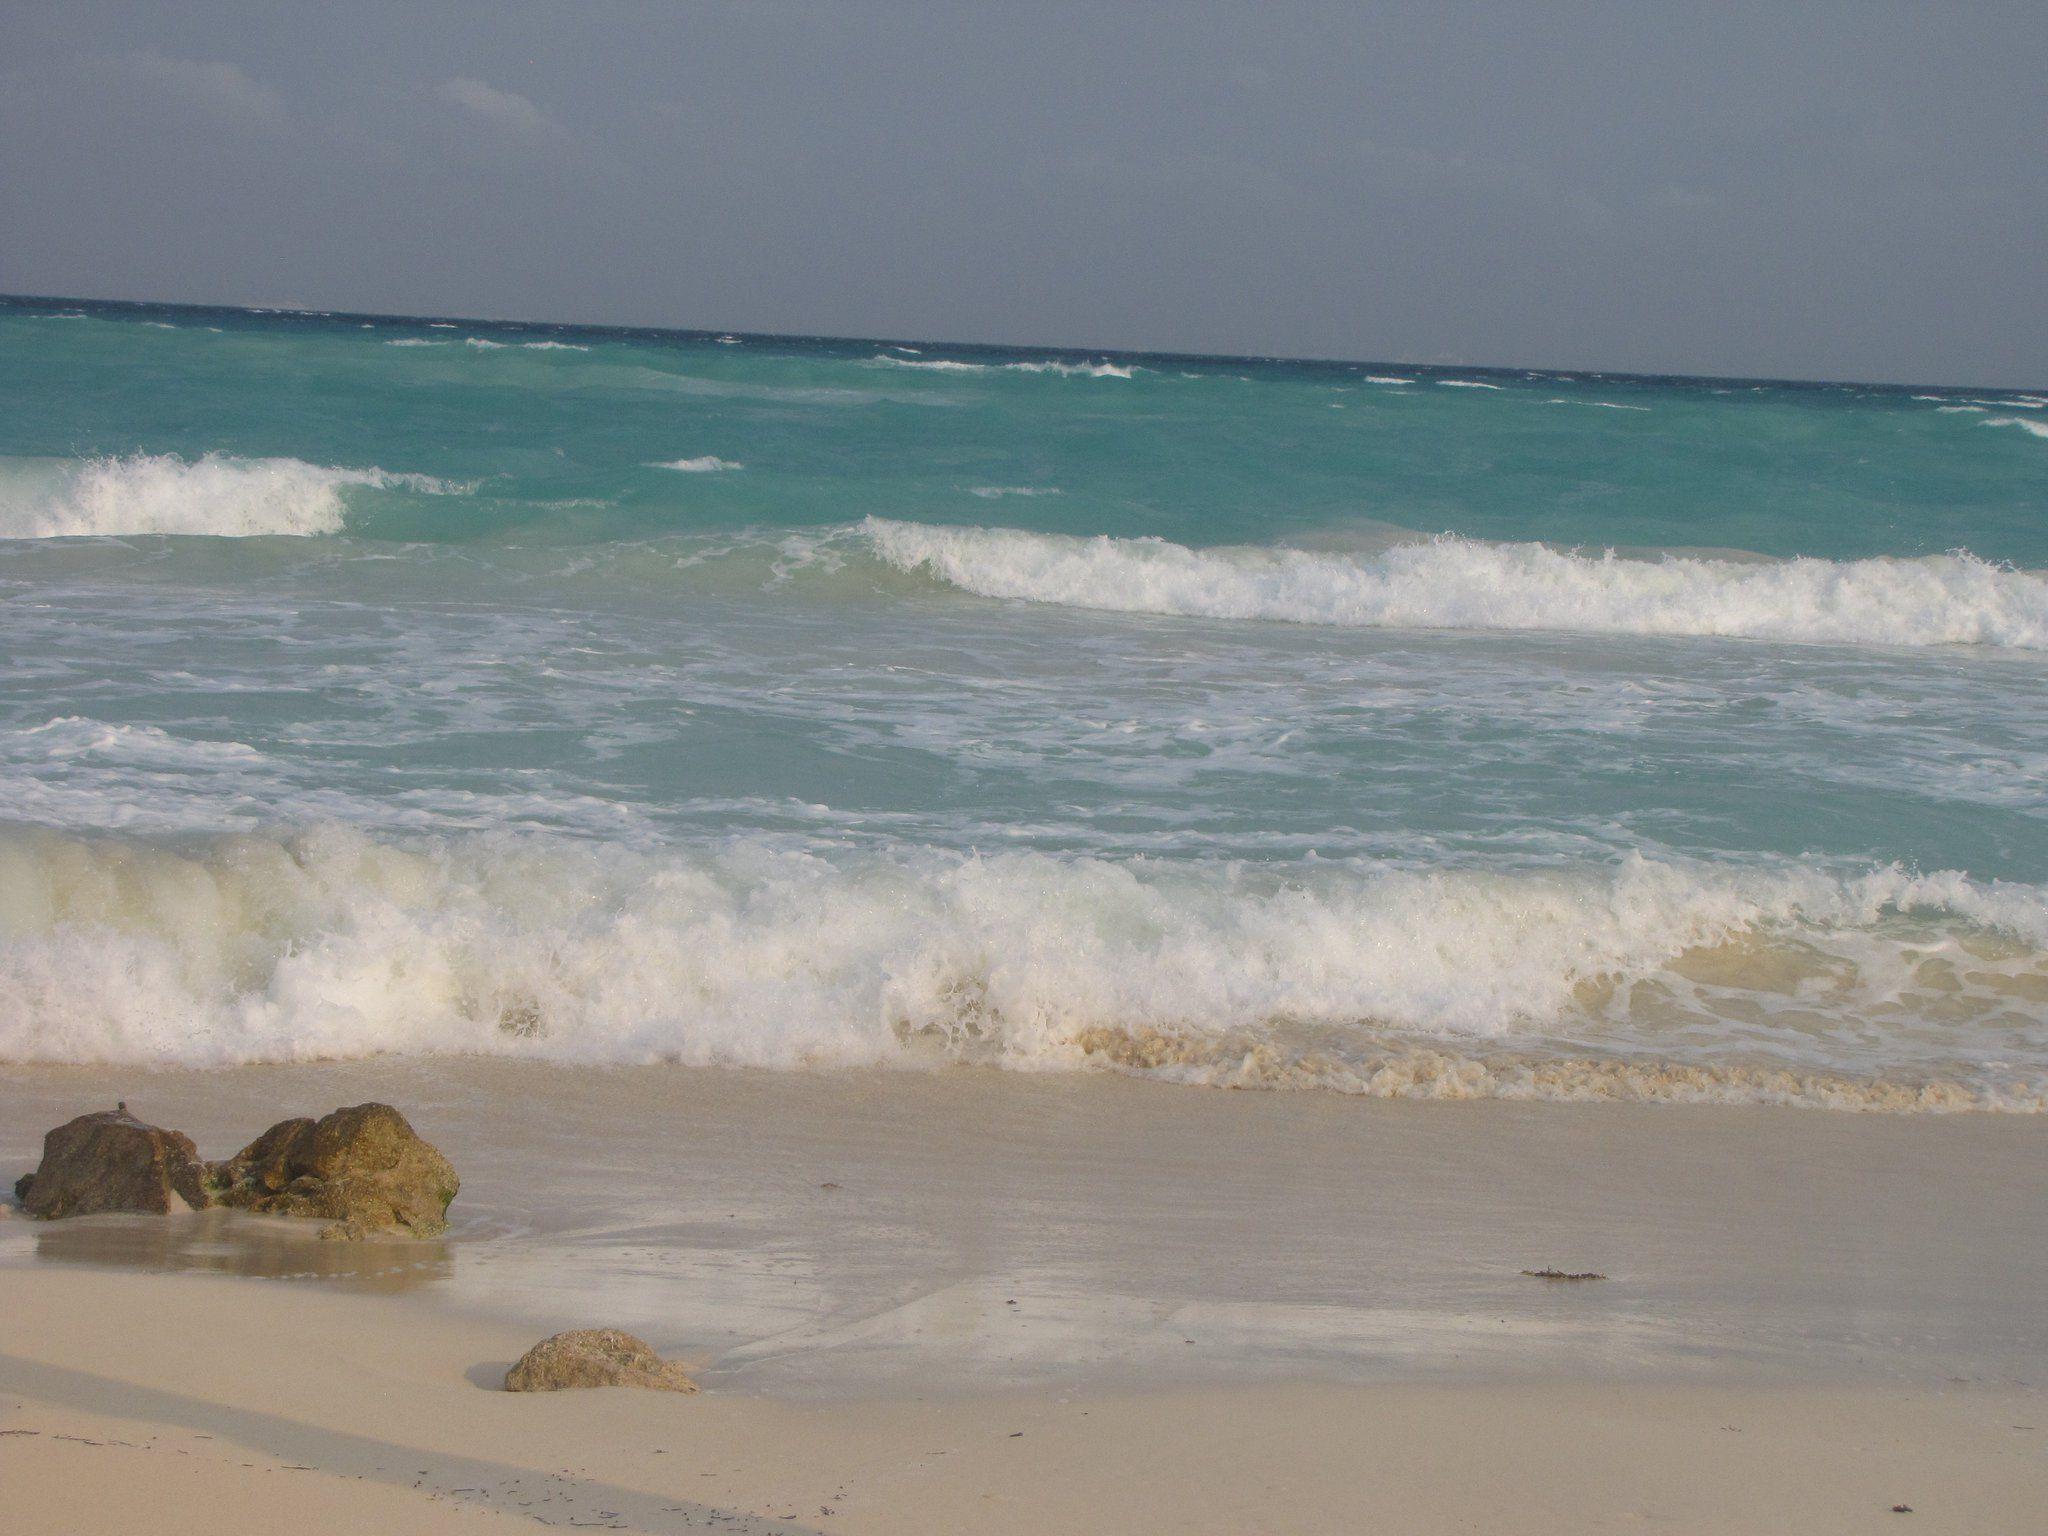 Playa del Carmen-2011